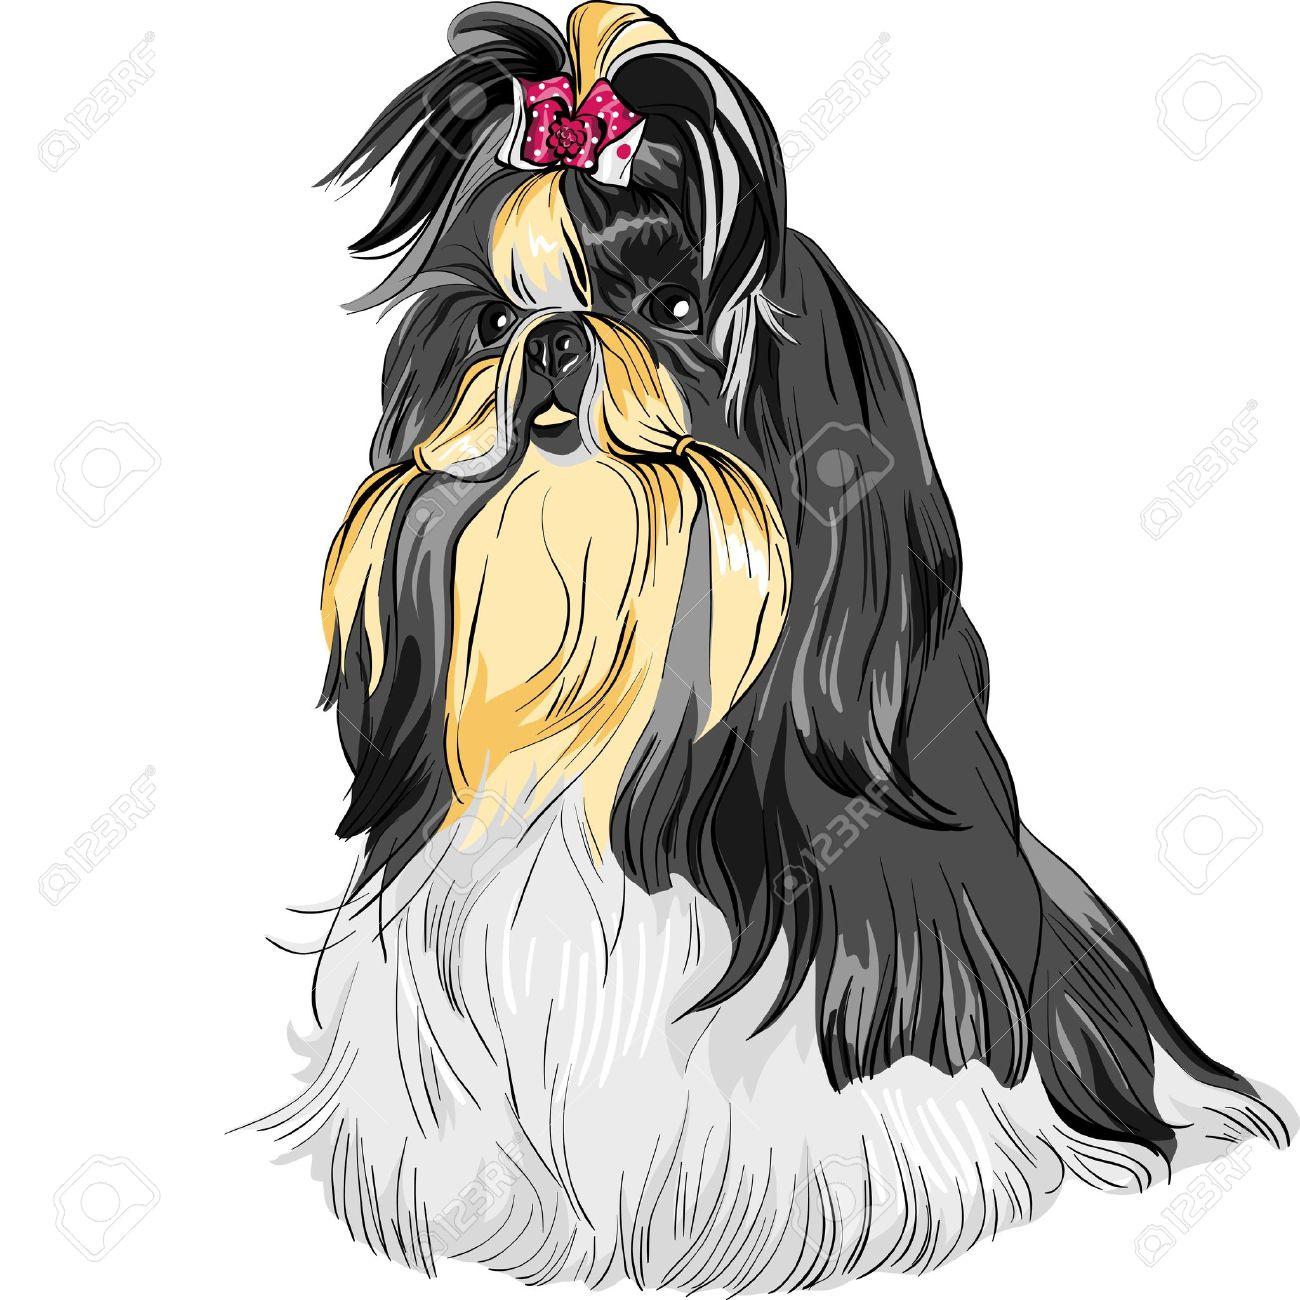 color sketch of the dog Shih Tzu dog-lion; dog-chrysanthemum Chinese breed - 13185098